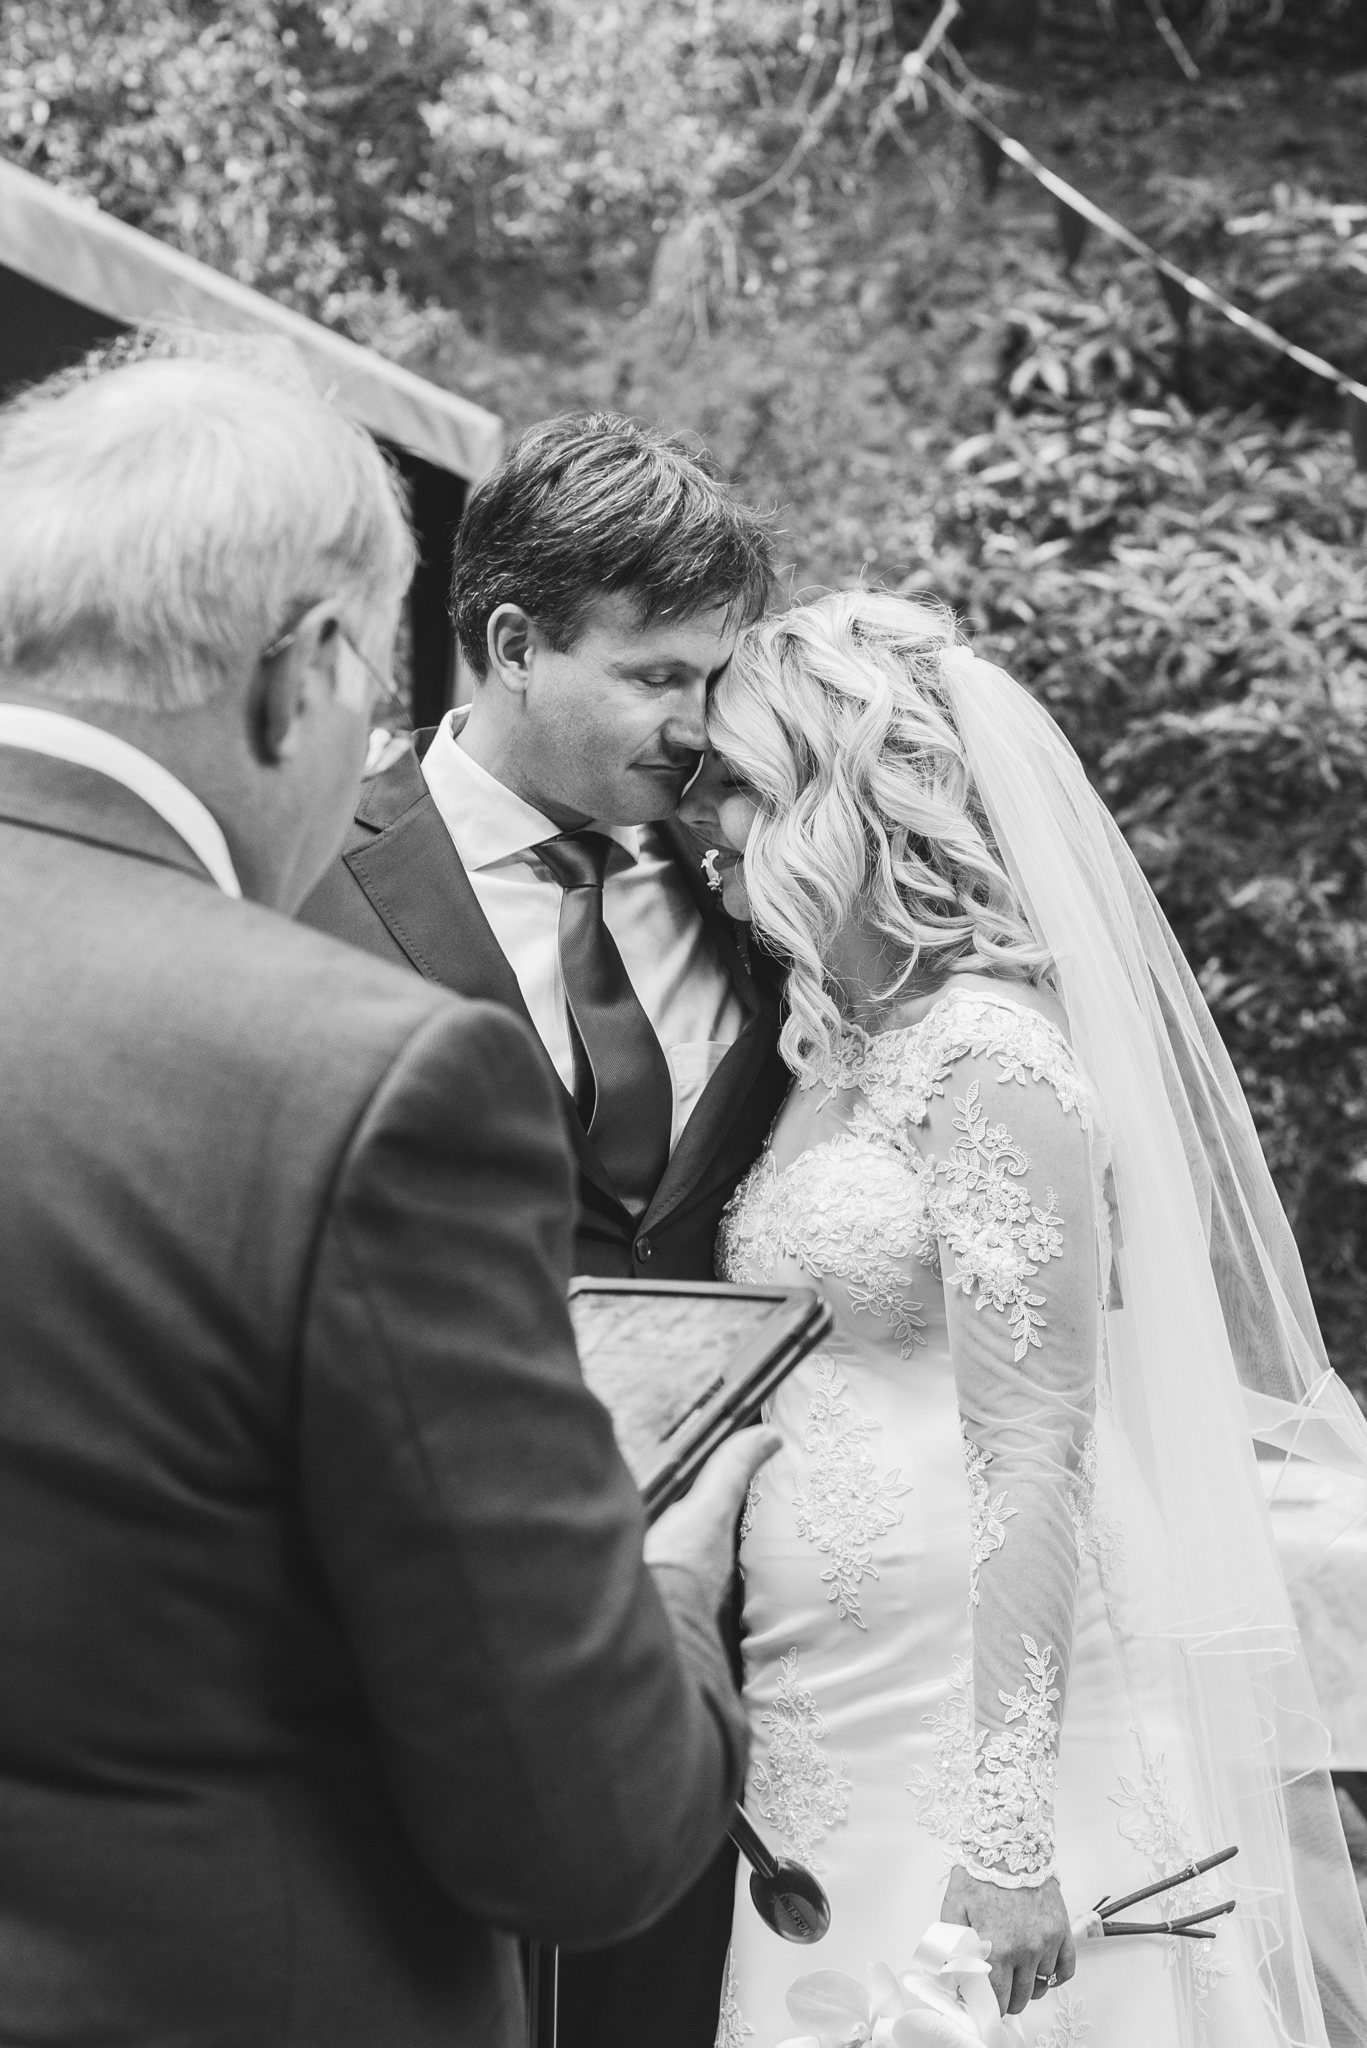 Angelique_Smith_Photography_Pieter&Yvonne_Wedding-254.jpg